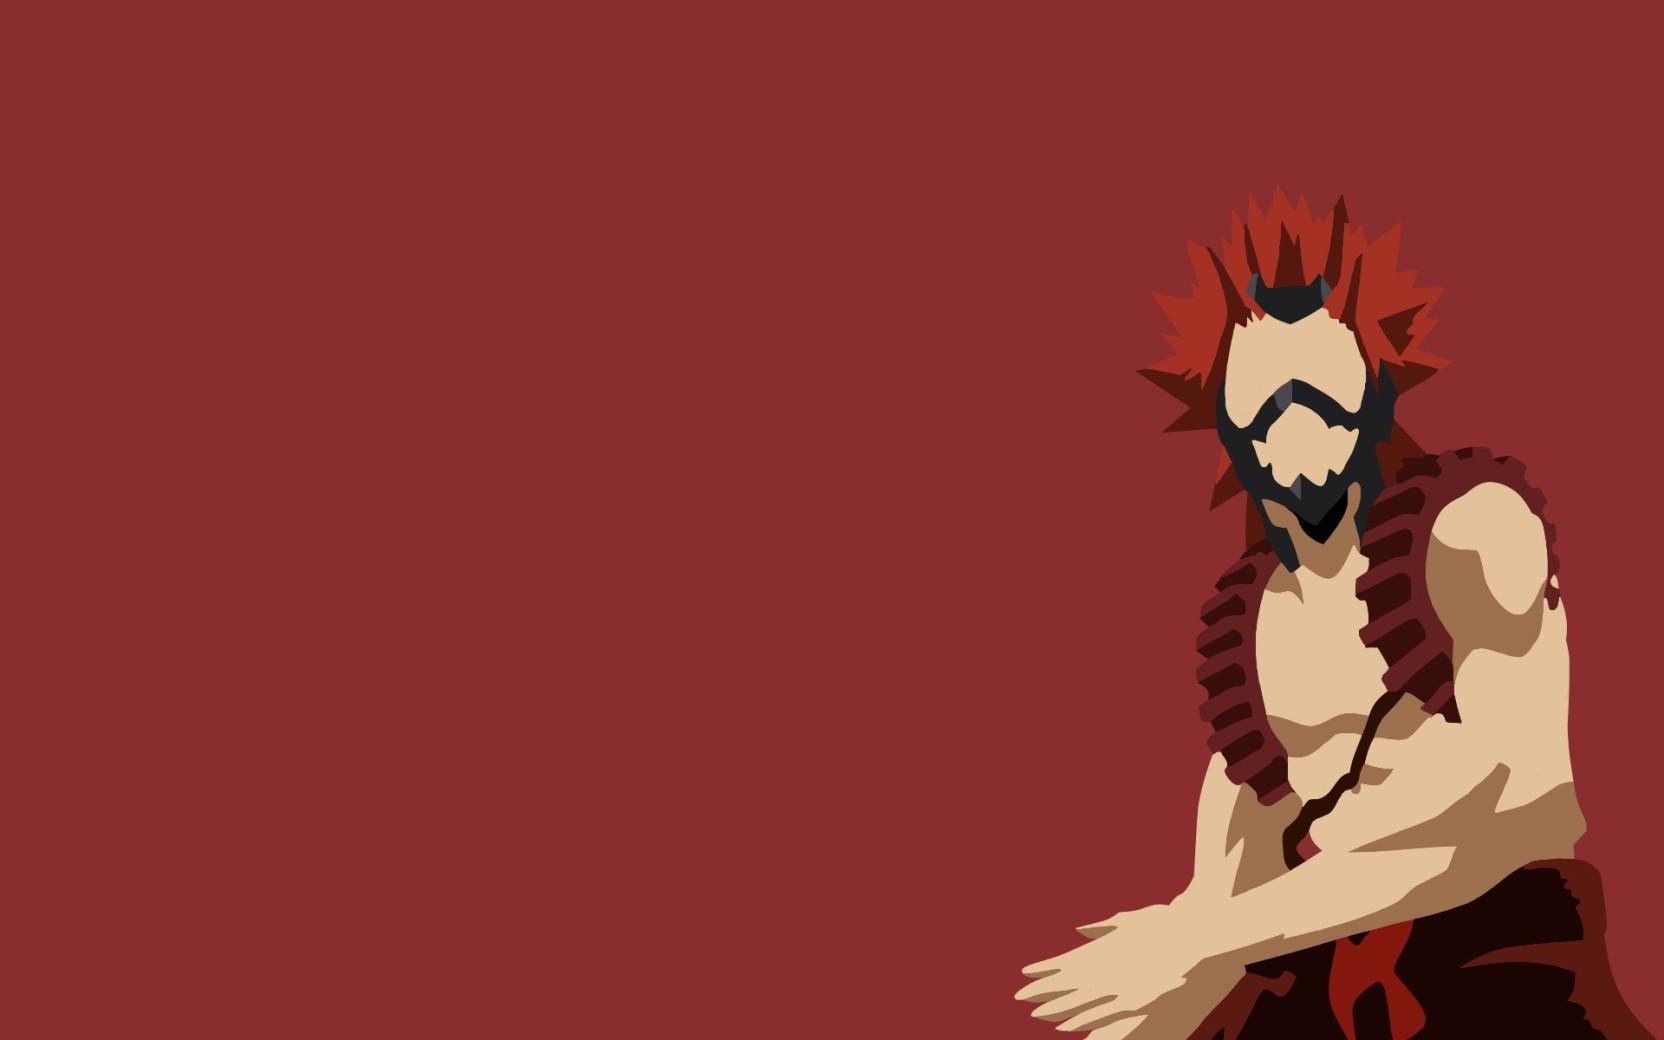 Athah Anime My Hero Academia Eijiro Kirishima 13 19 Inches